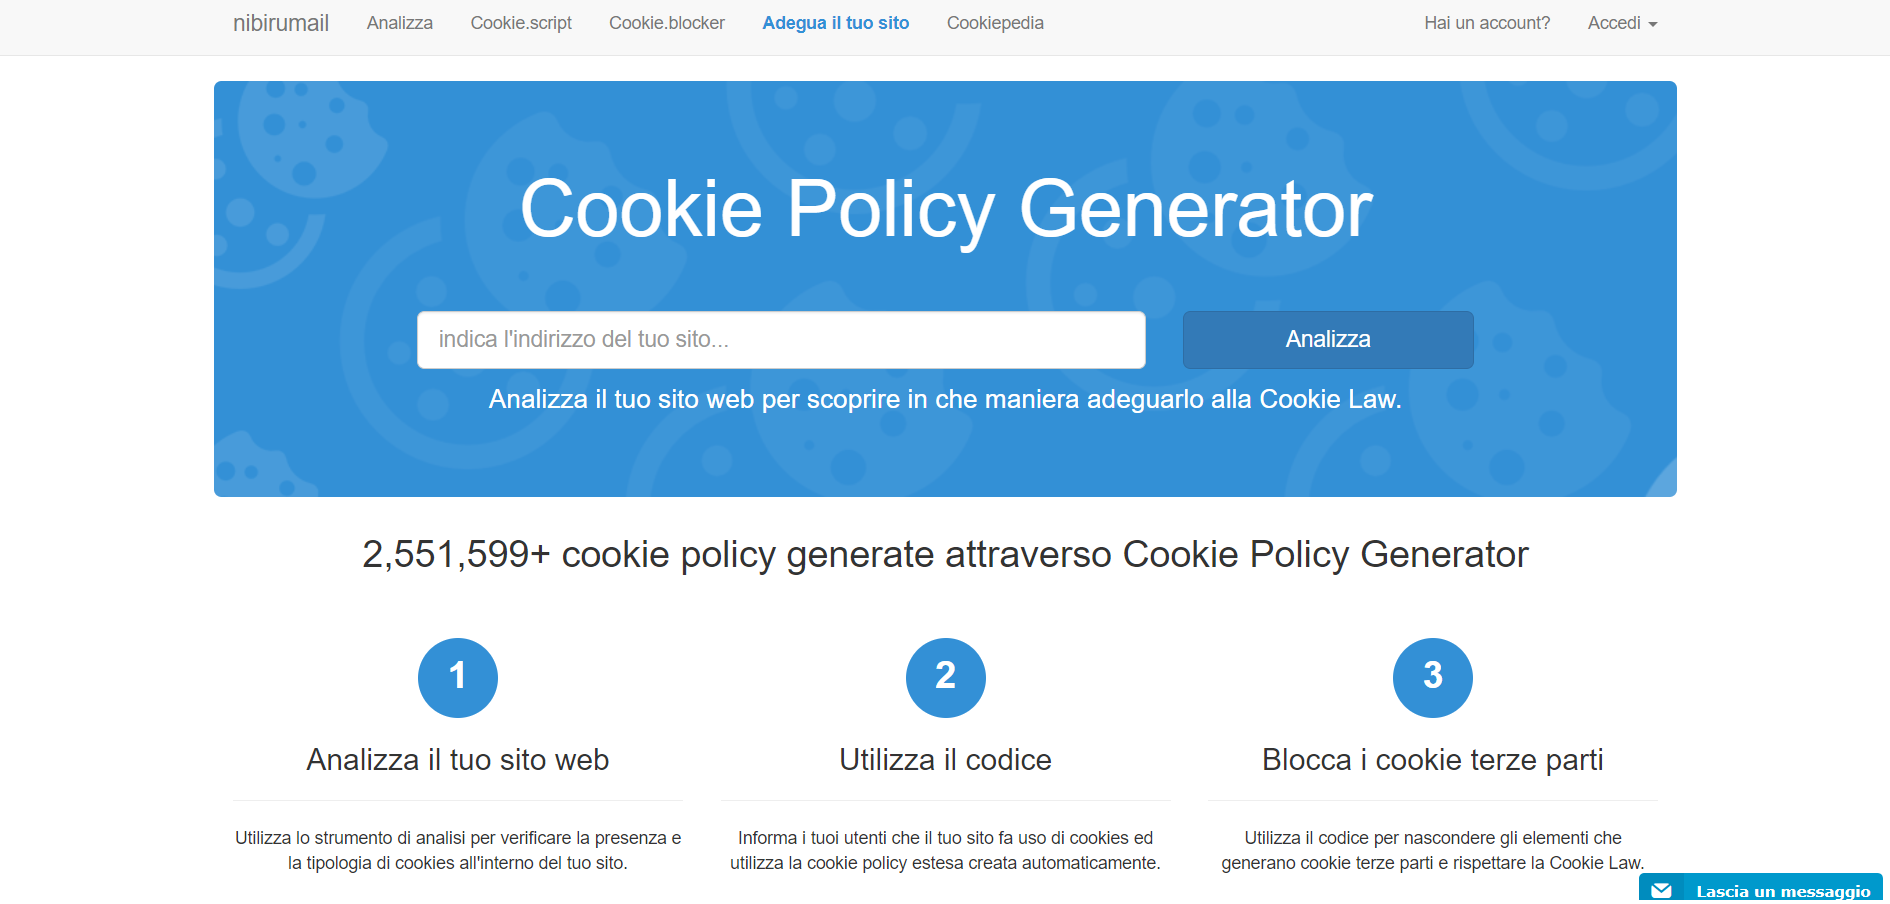 cookie policy generatore nabirumail alternativa a iubenda